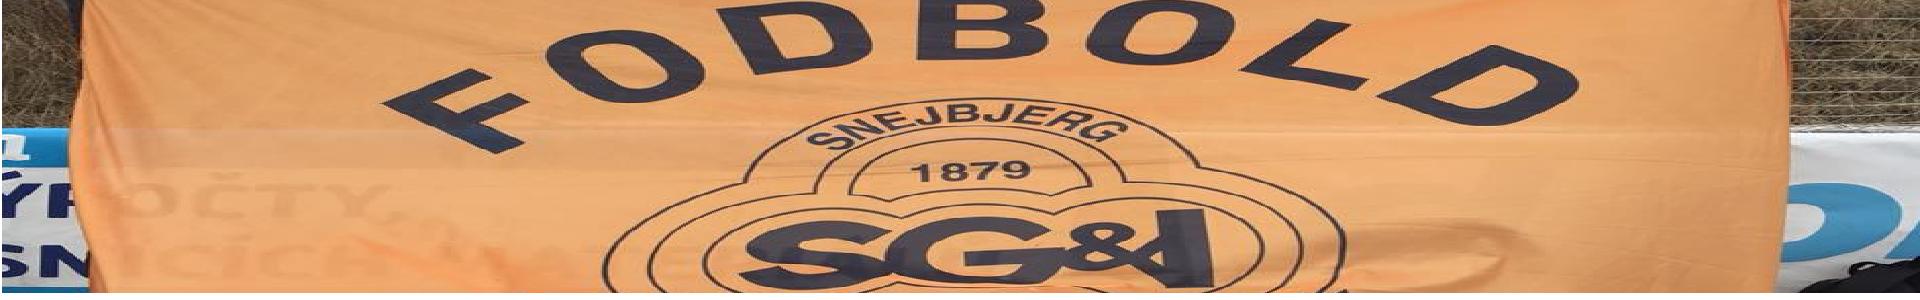 Banner Snejbjerg fodbold